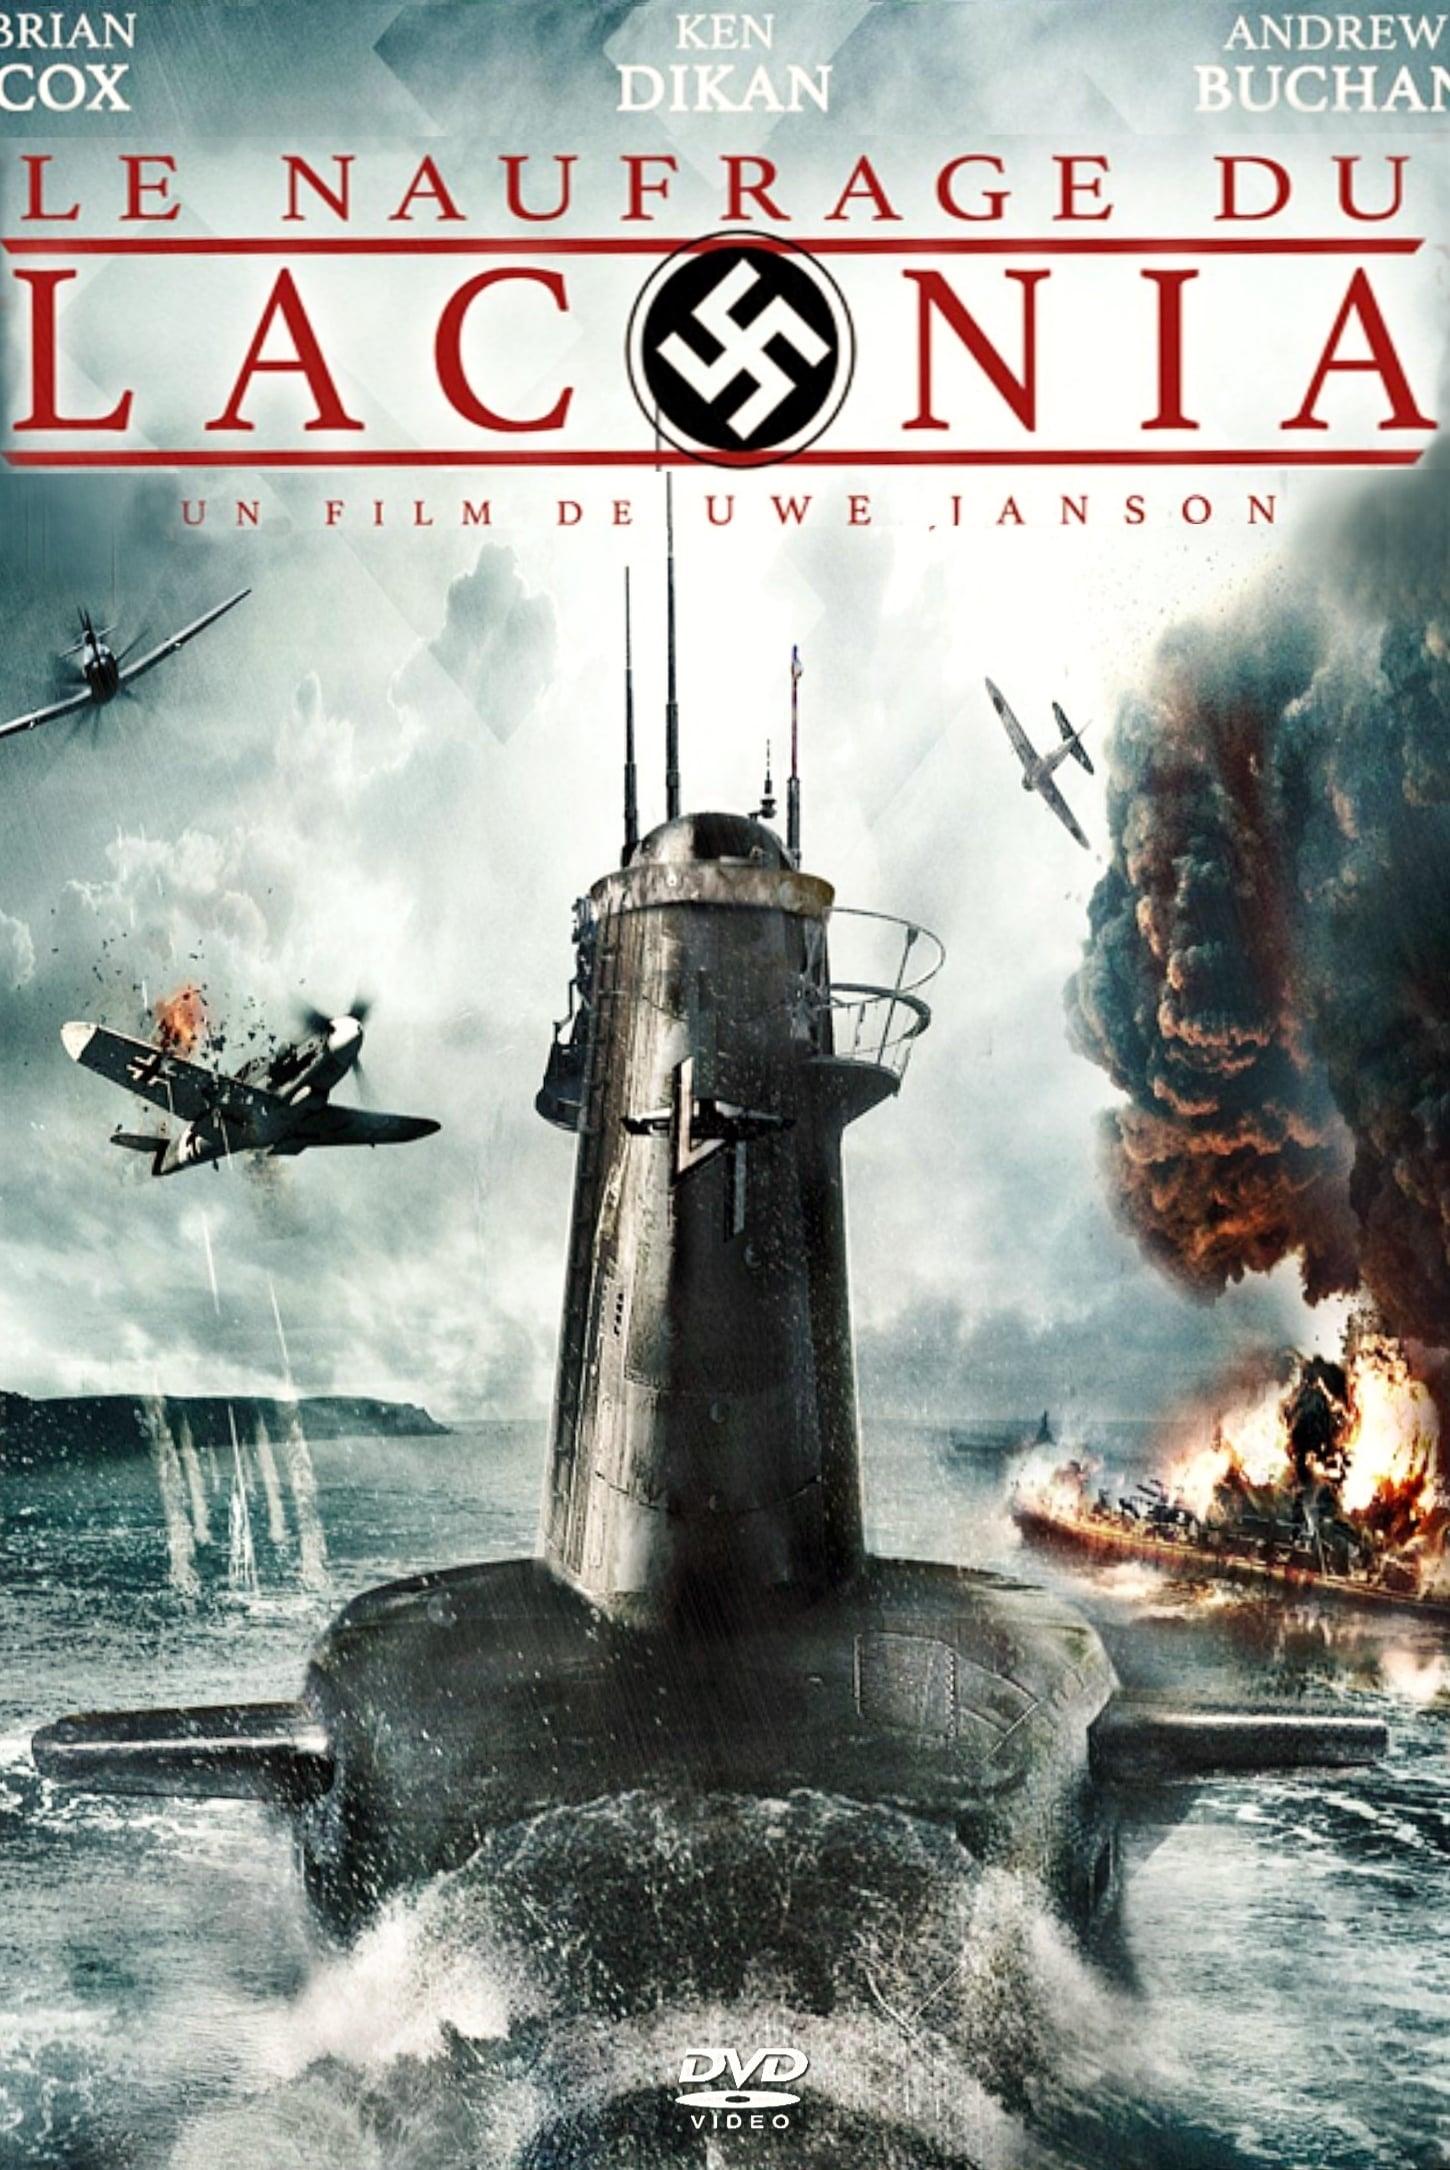 Le Naufrage du Laconia series tv complet